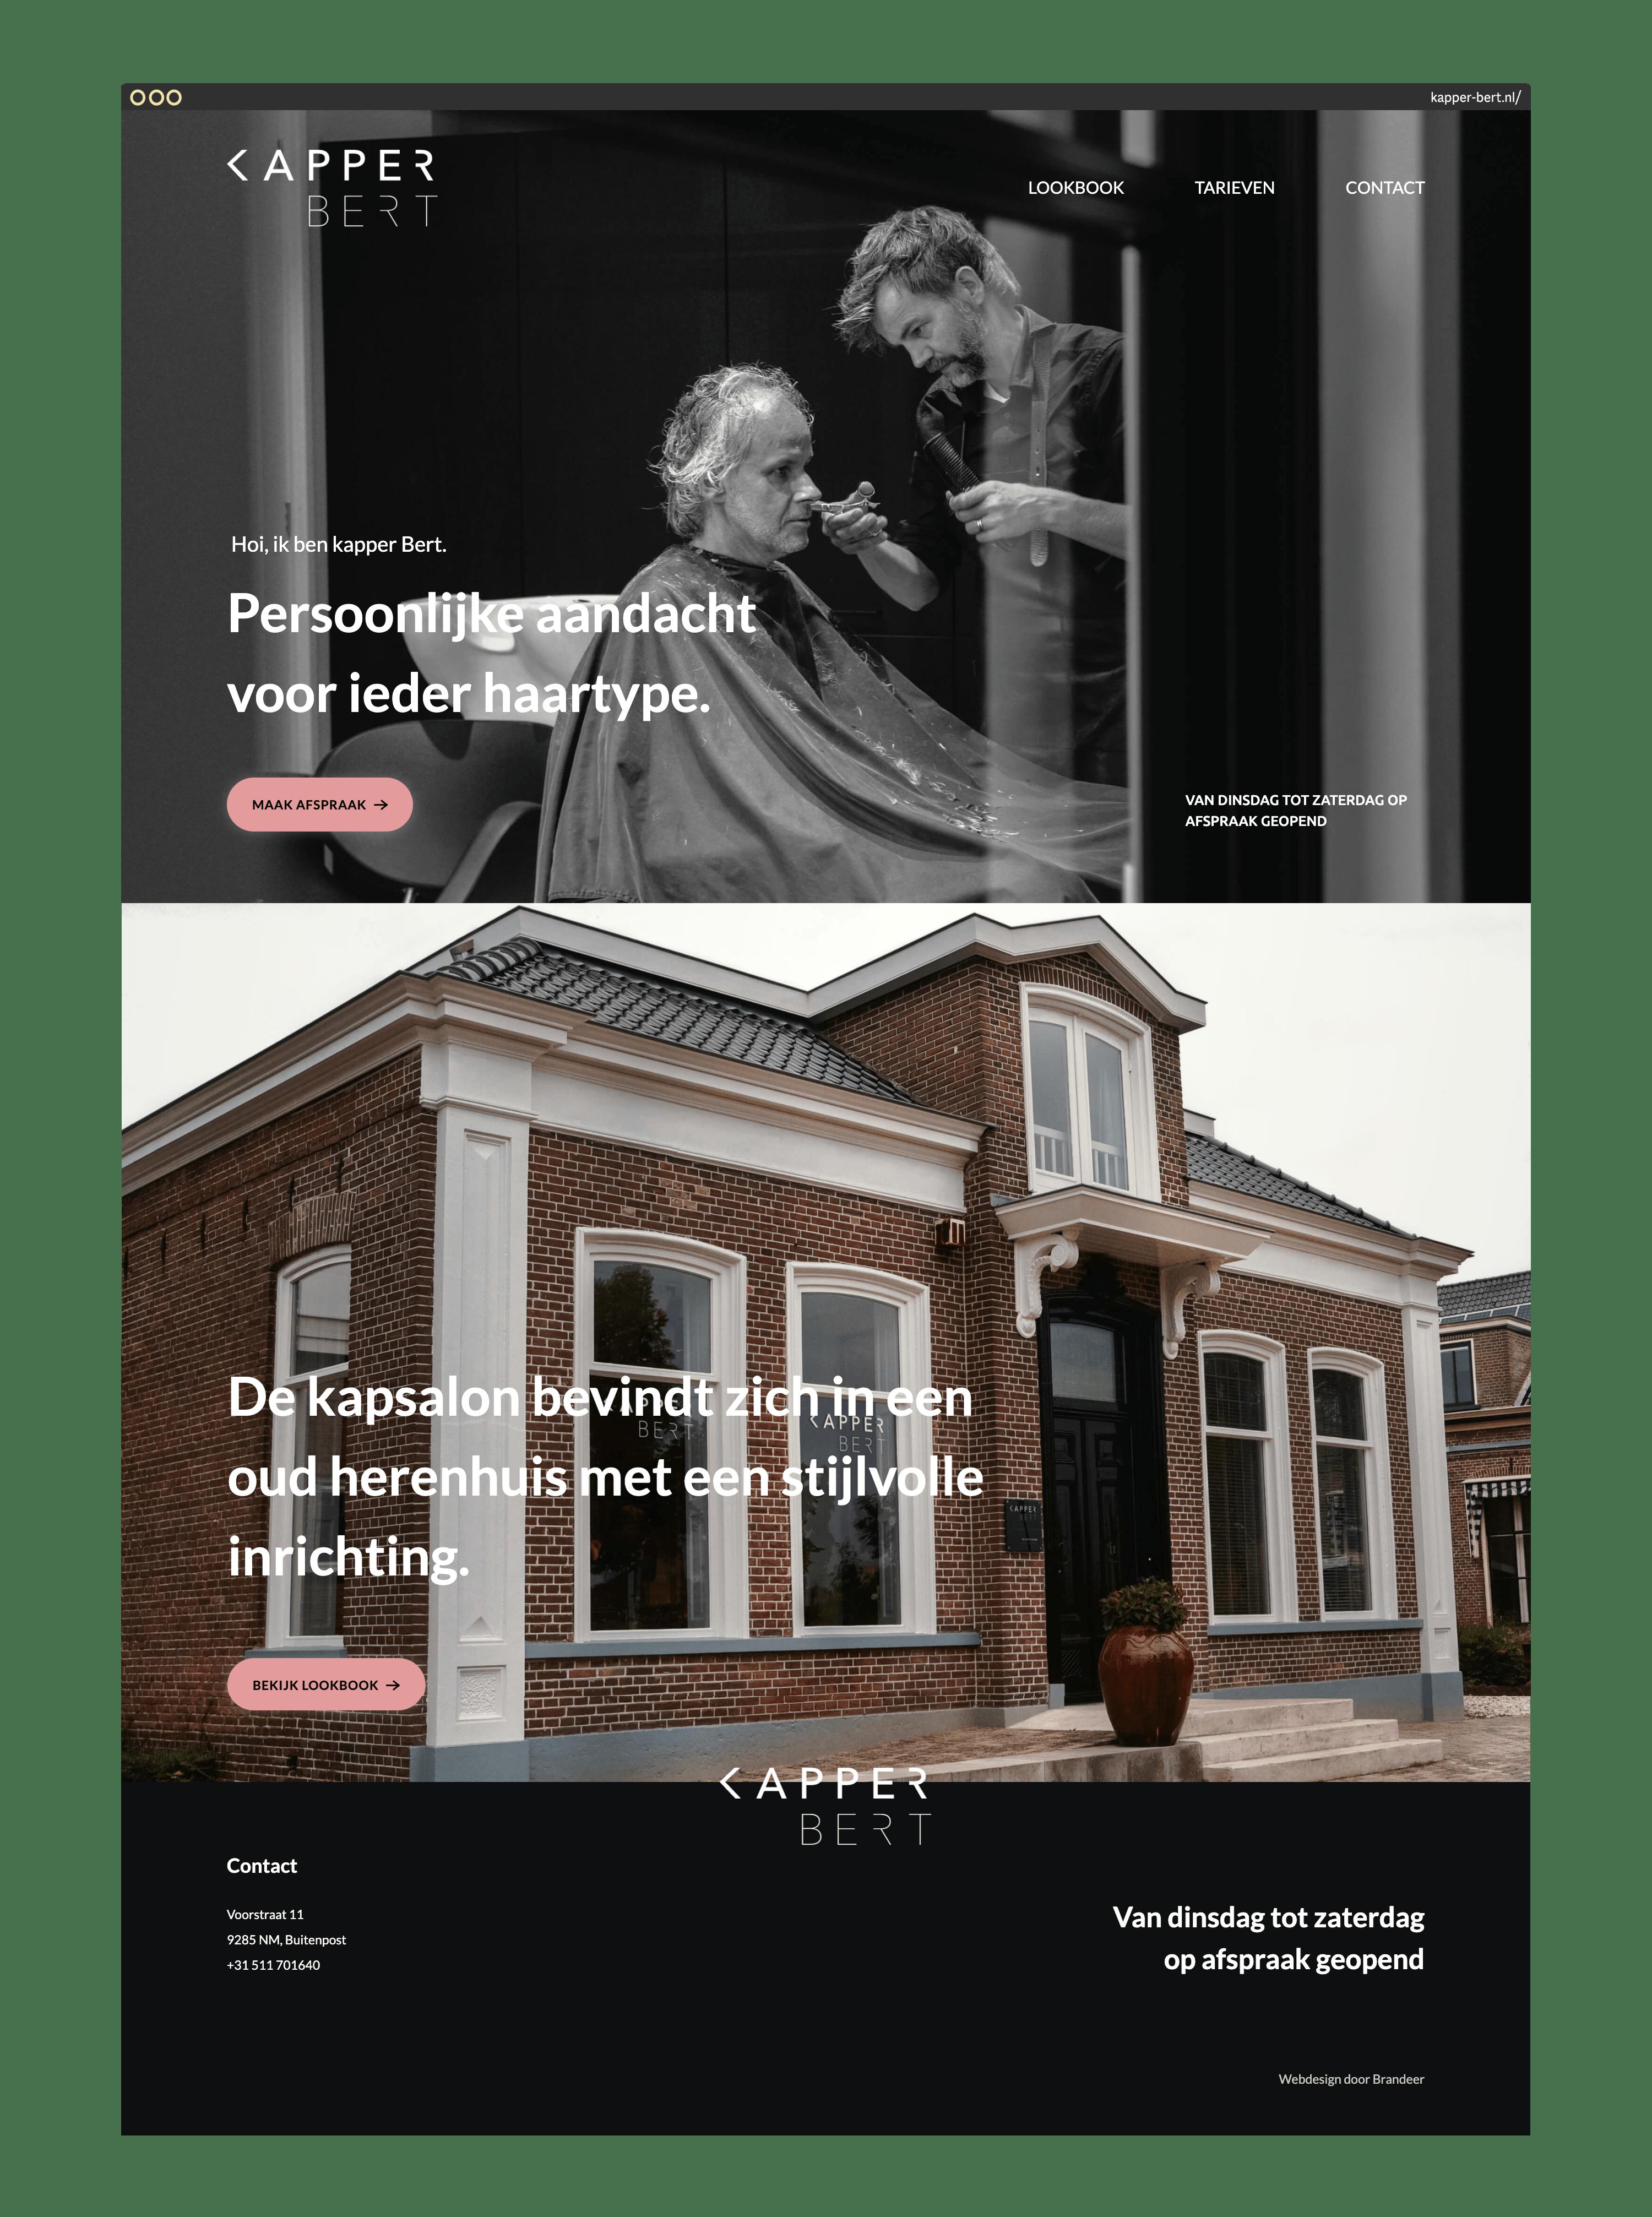 kapper-bert-homepage